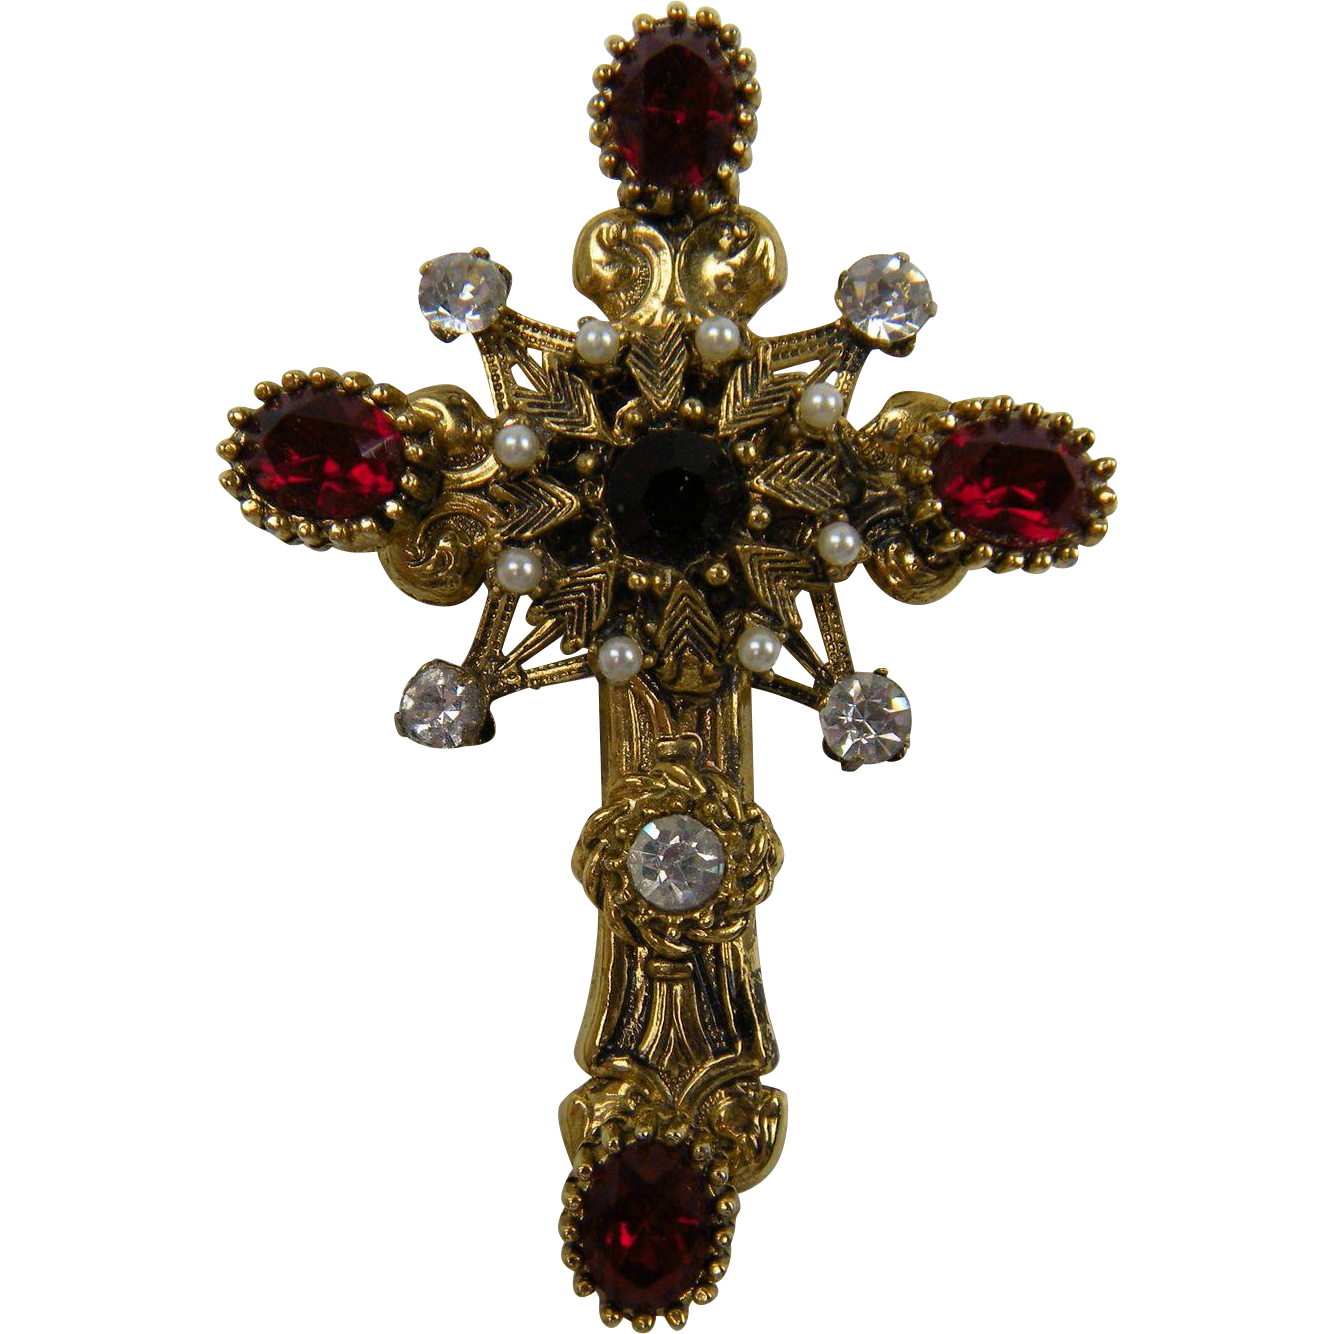 Rhinestone and Imitation Pearl Gold Plated Cross Brooch/Pendant